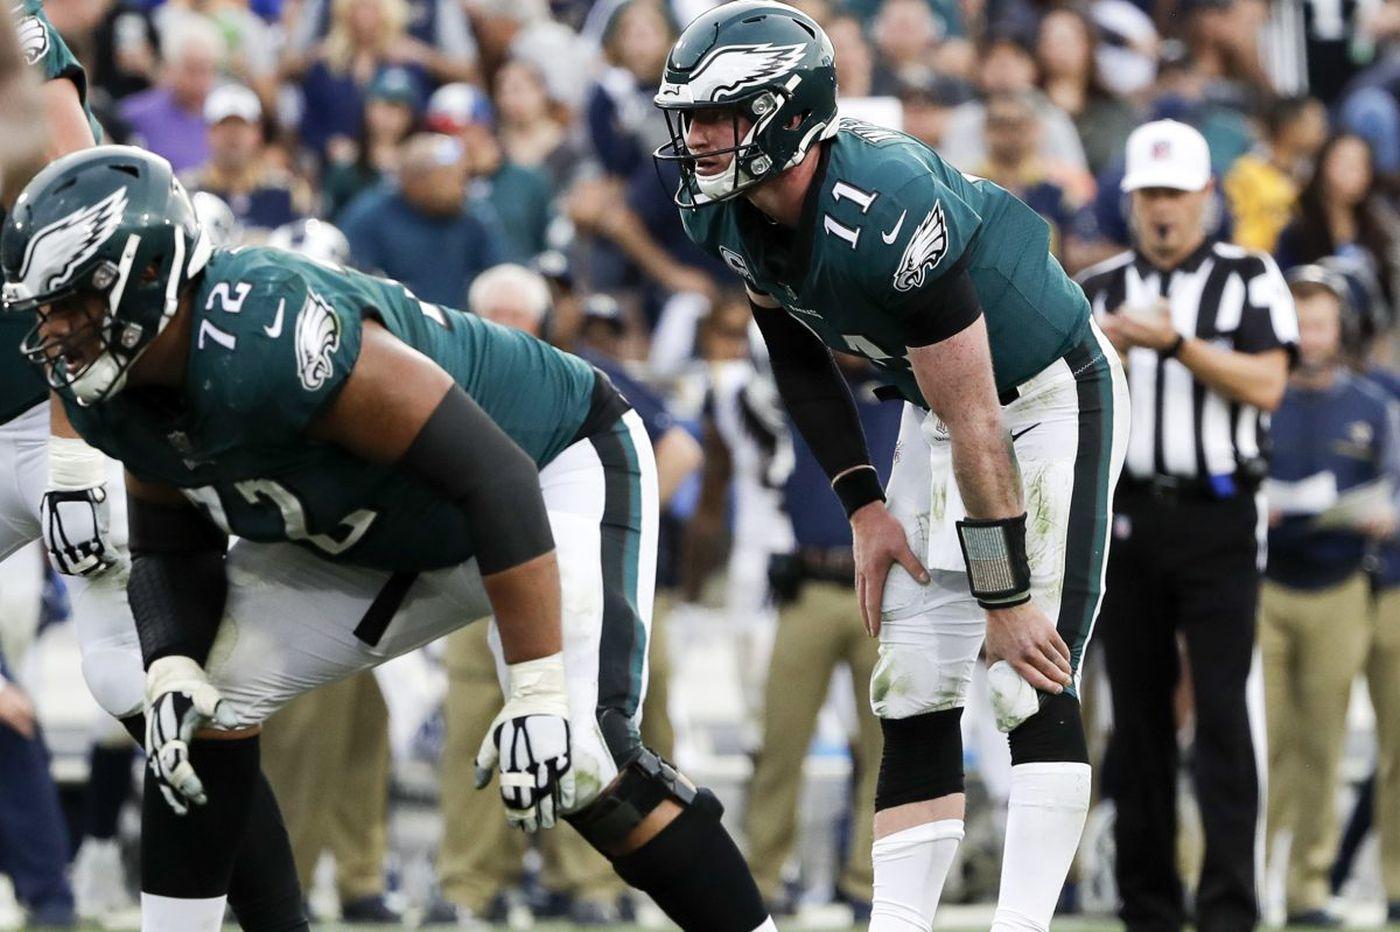 Carson Wentz amazes with his toughness, but his injury seemed inevitable | Jeff McLane